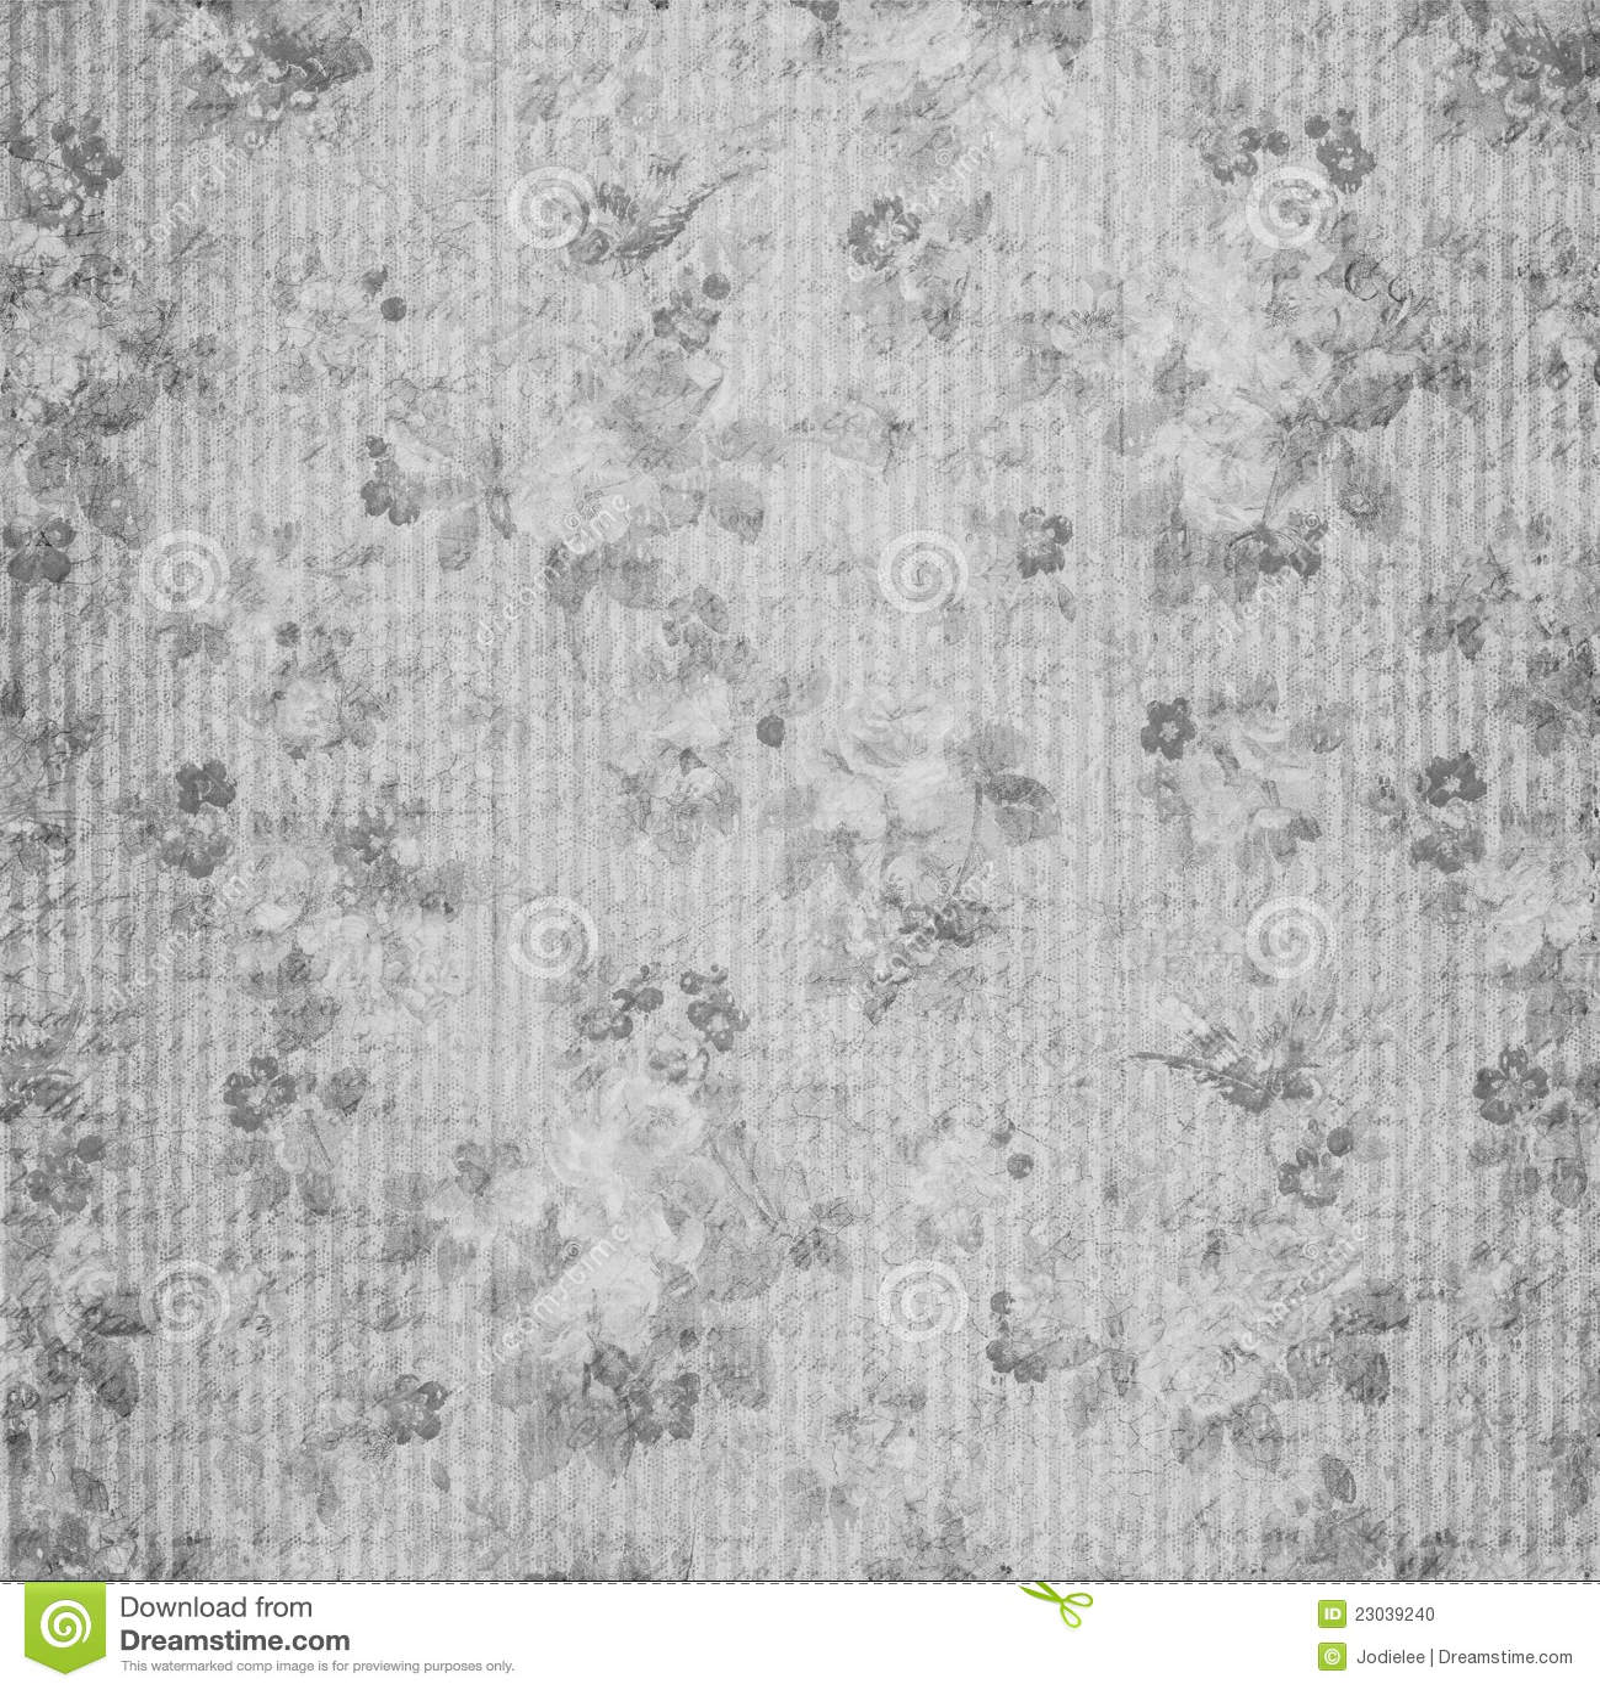 Blue Floral Shabby Chic Vintage Scrapbook Paper Stock Illustration